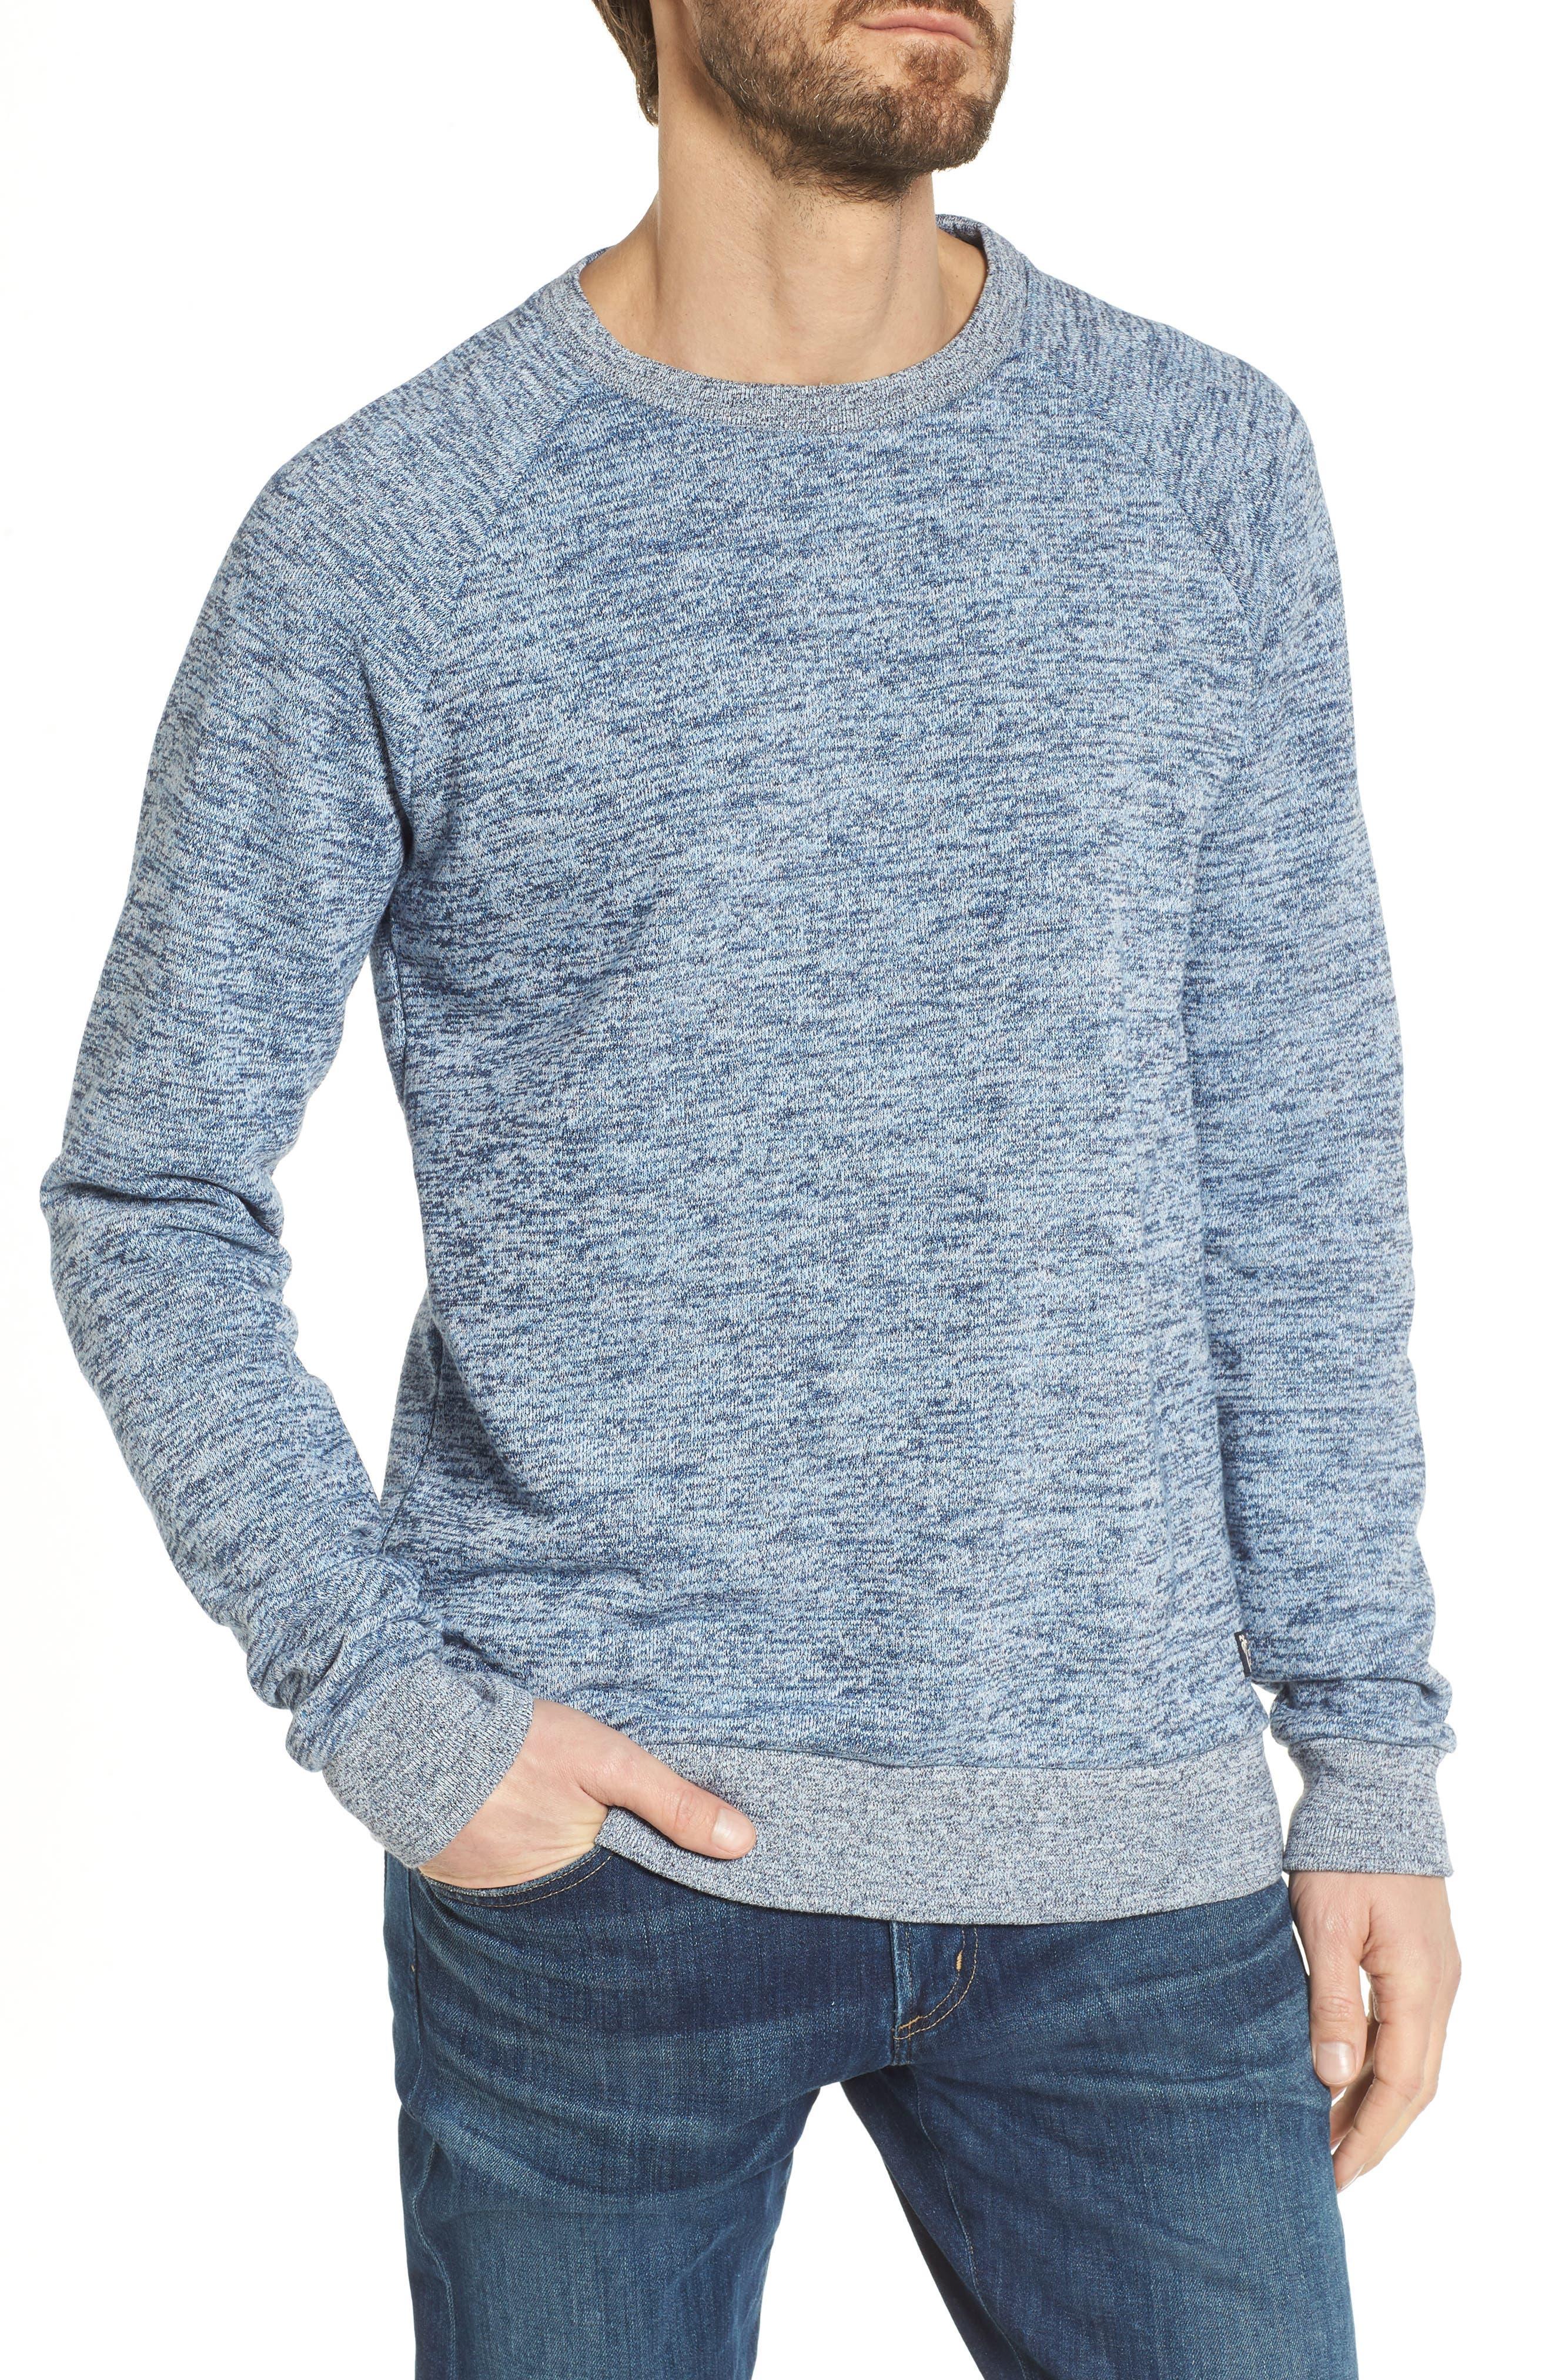 Mélange Sweatshirt,                             Main thumbnail 1, color,